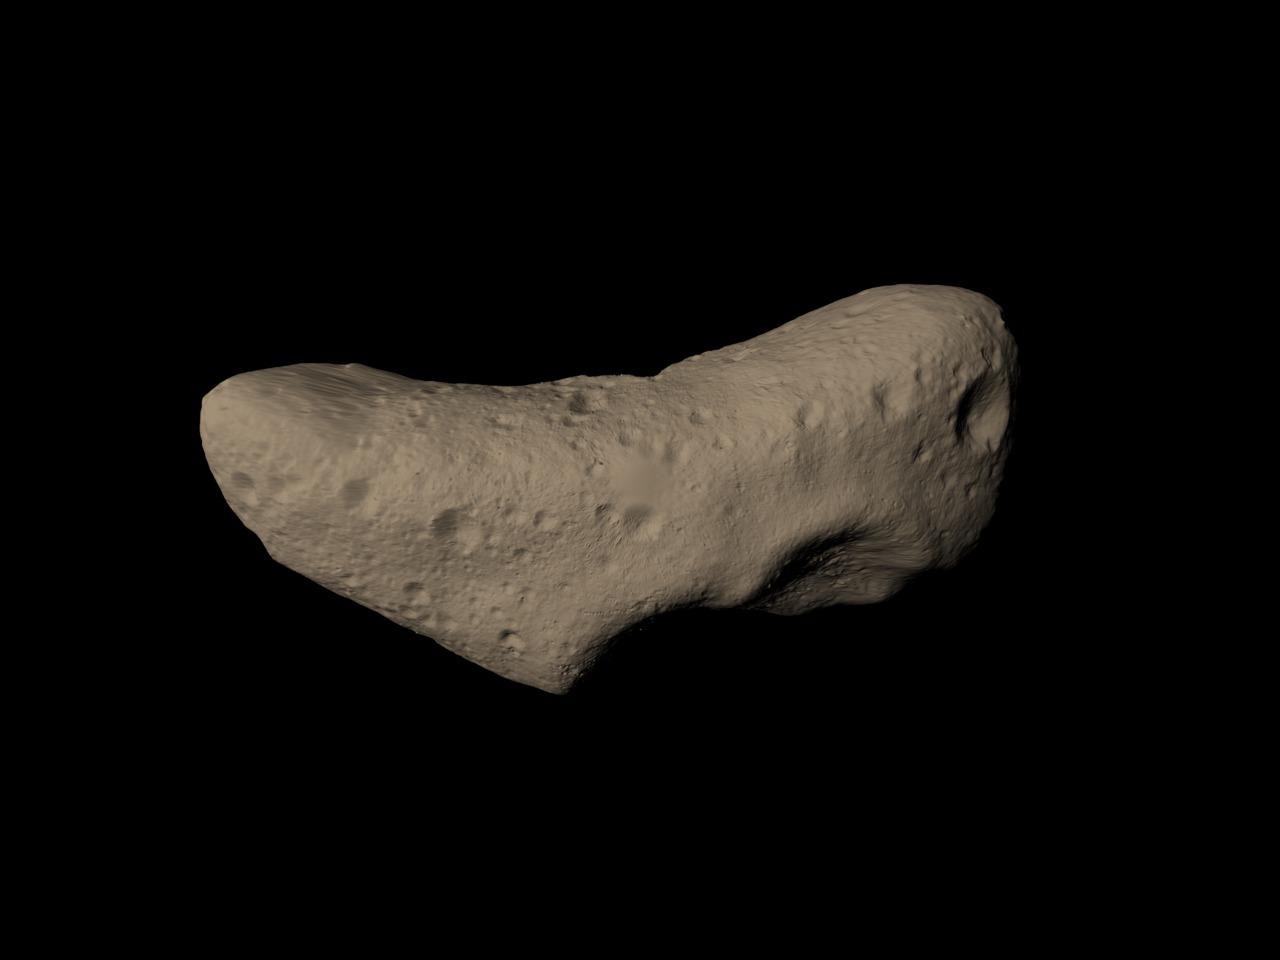 SVS: NEAR Views the Asteroid Eros ('True' Color)